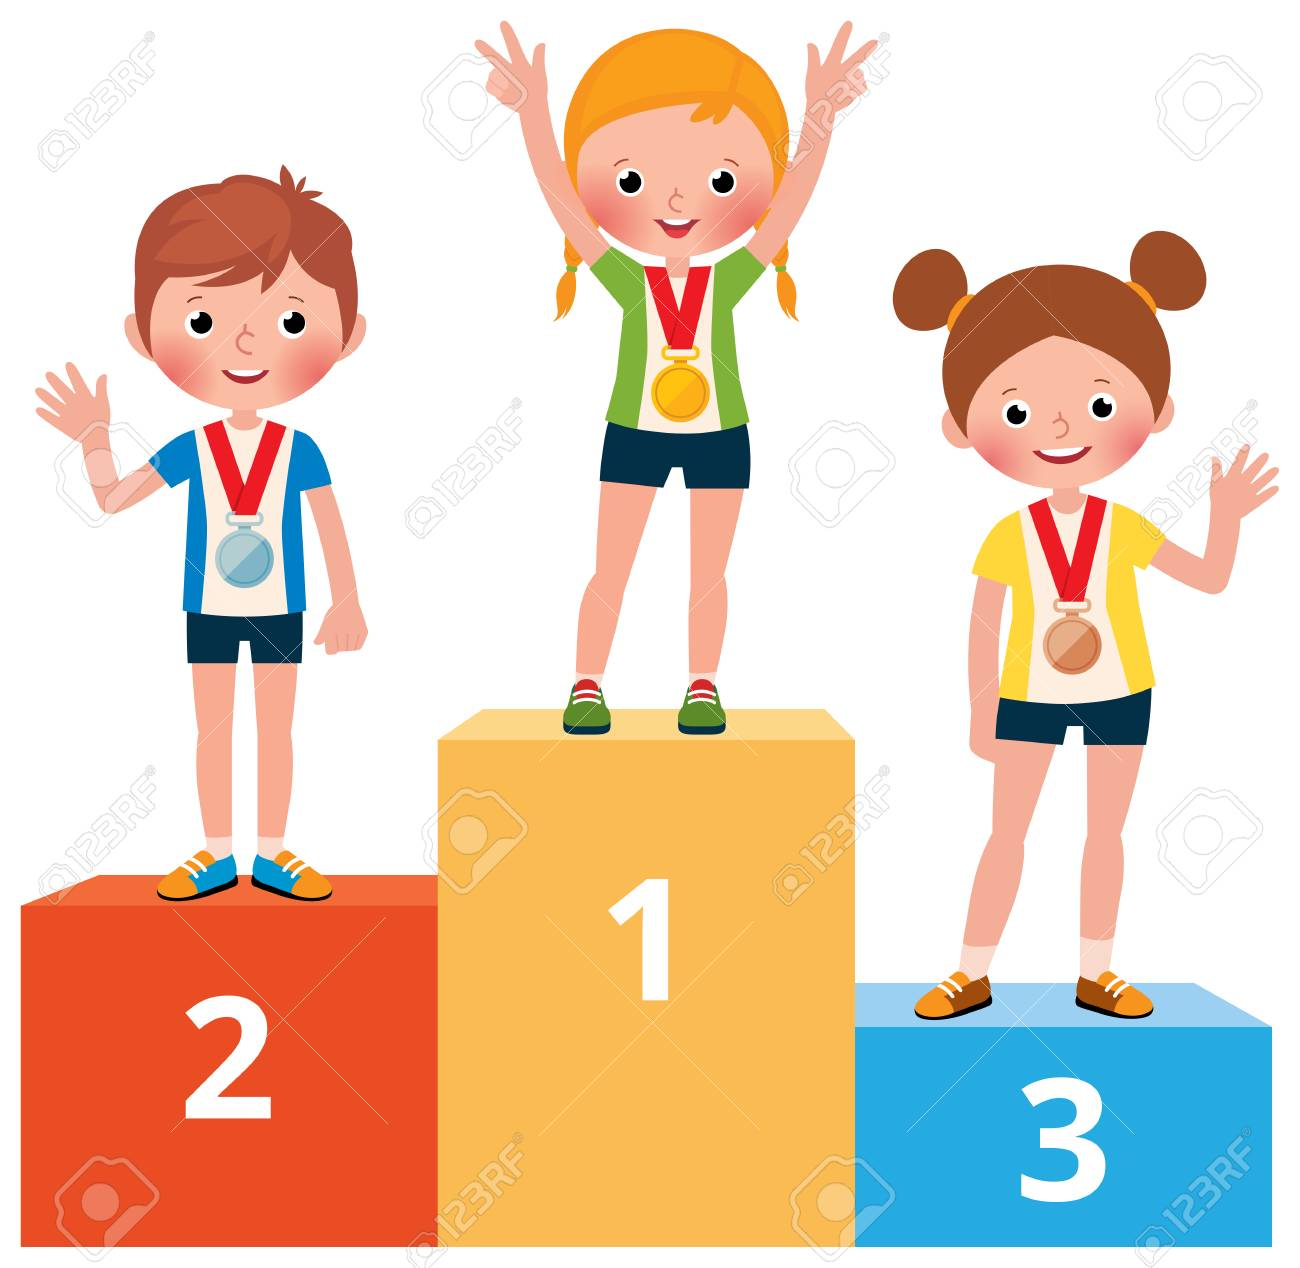 Children sportsmen in sport clothes with medals on the pedestal vector cartoon illustration - 95631321